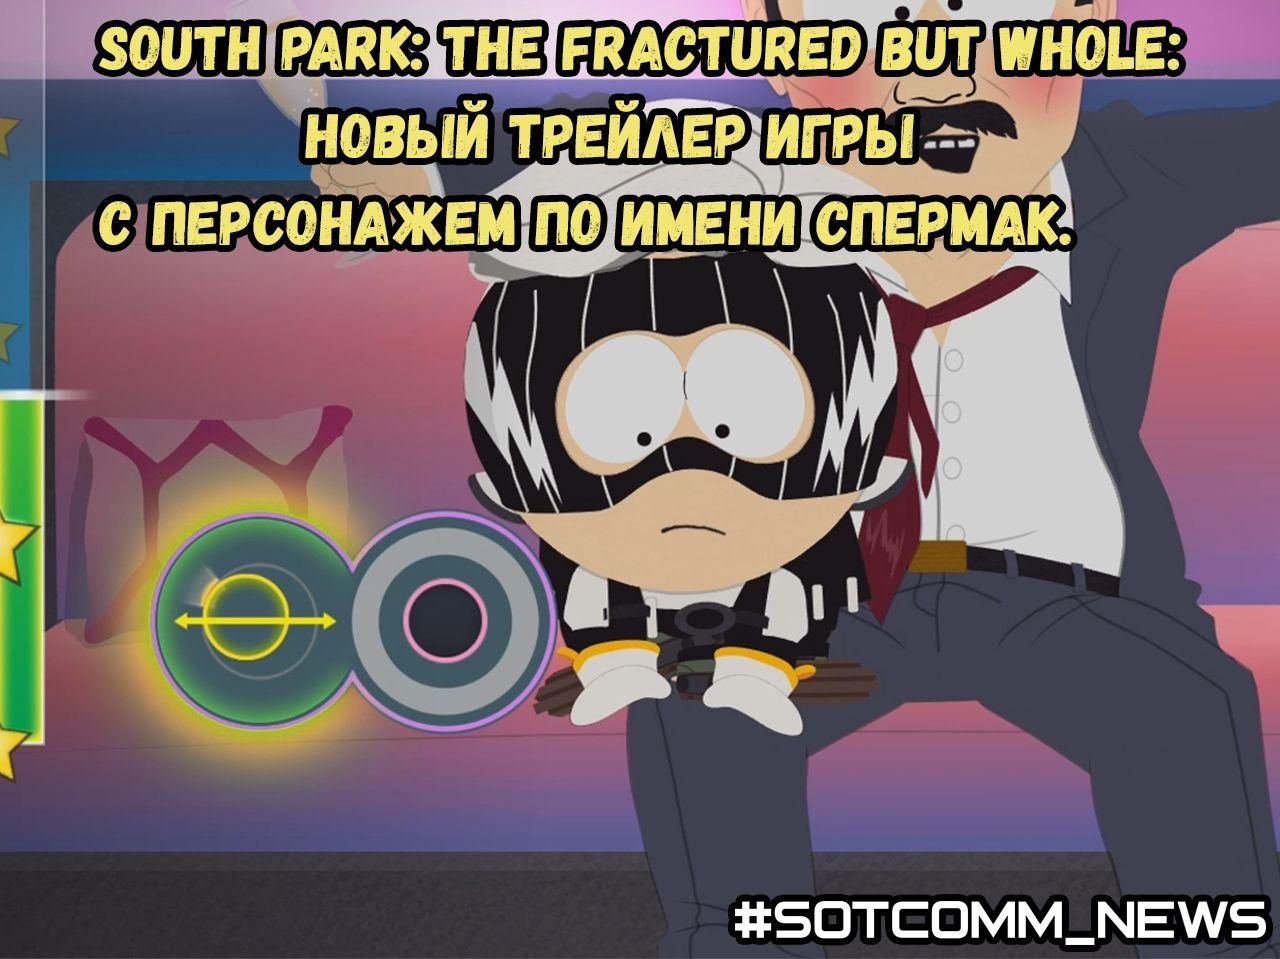 South Park: The Fractured But Whole: Вышел новый трейлер игры с персонажем по имени Спермак.